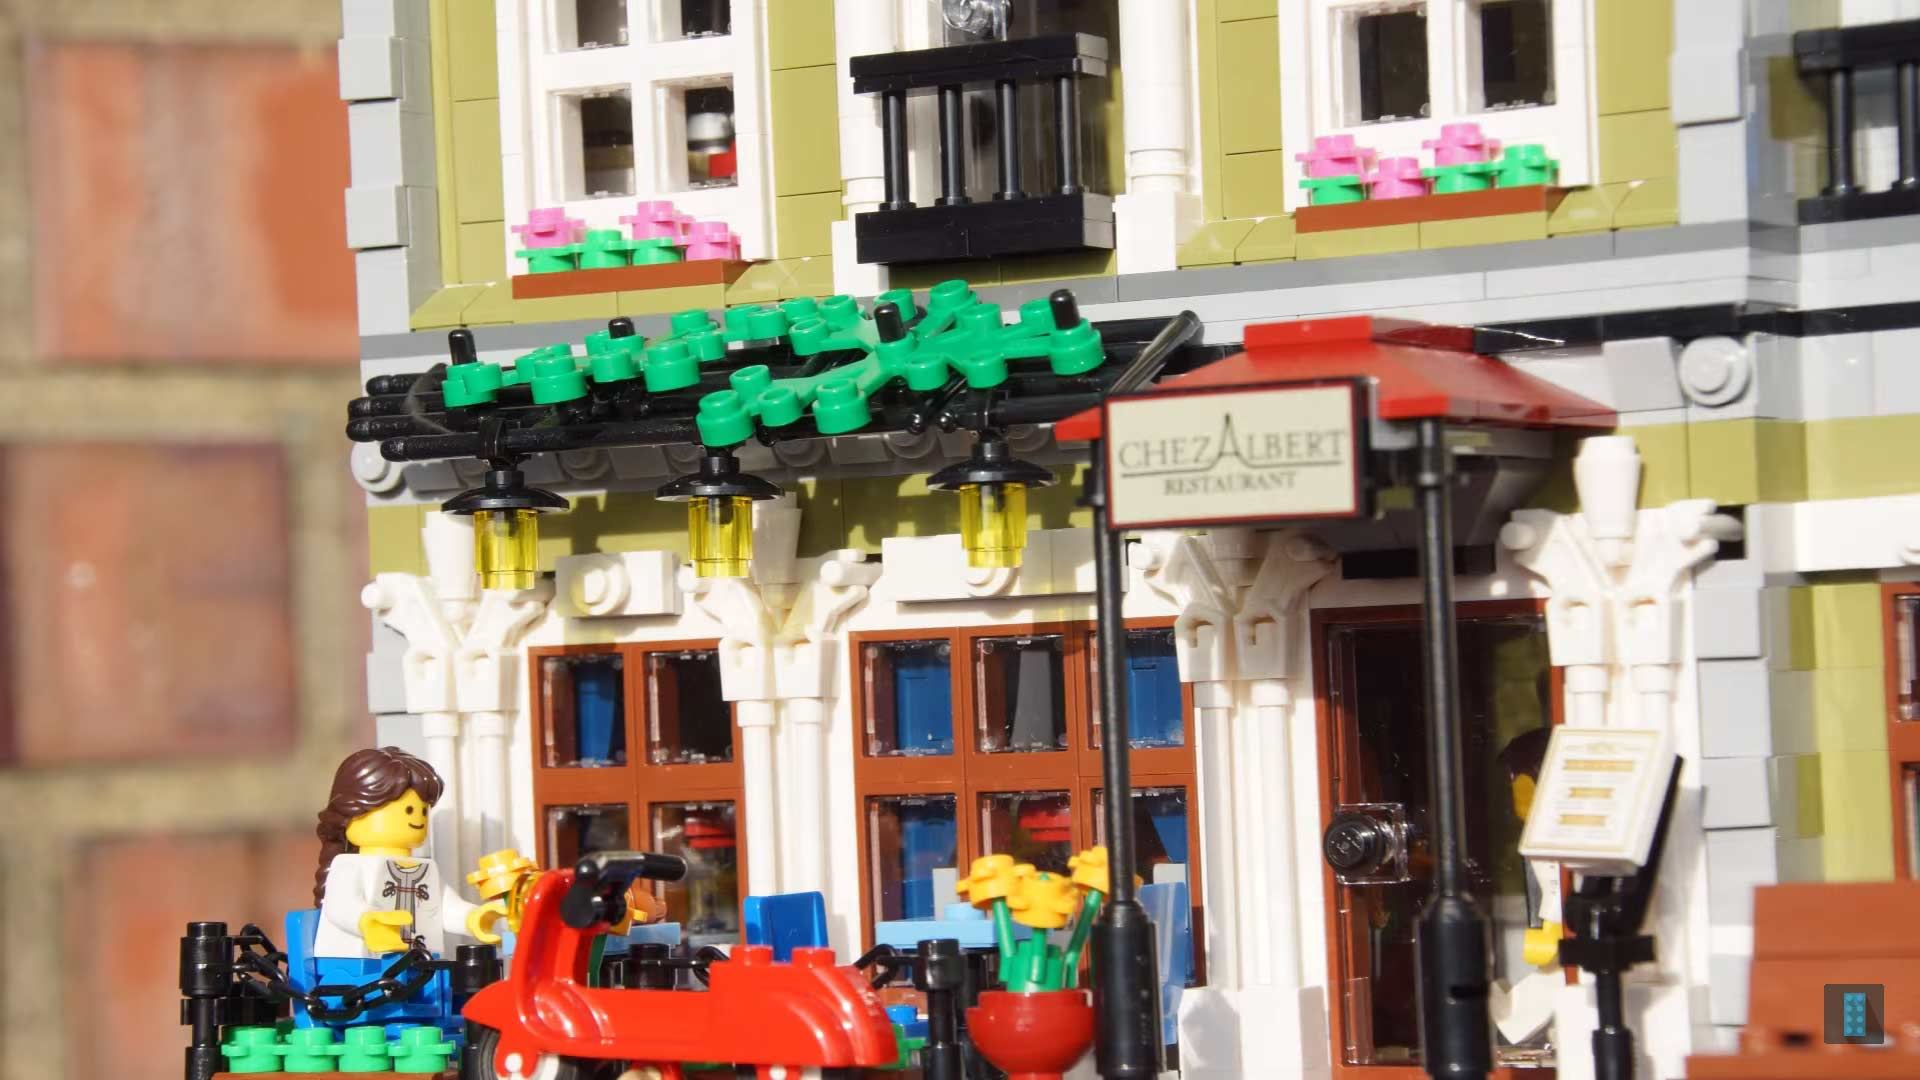 Parisian Restaurant | © Andres Lehmann / zusammengebaut.com